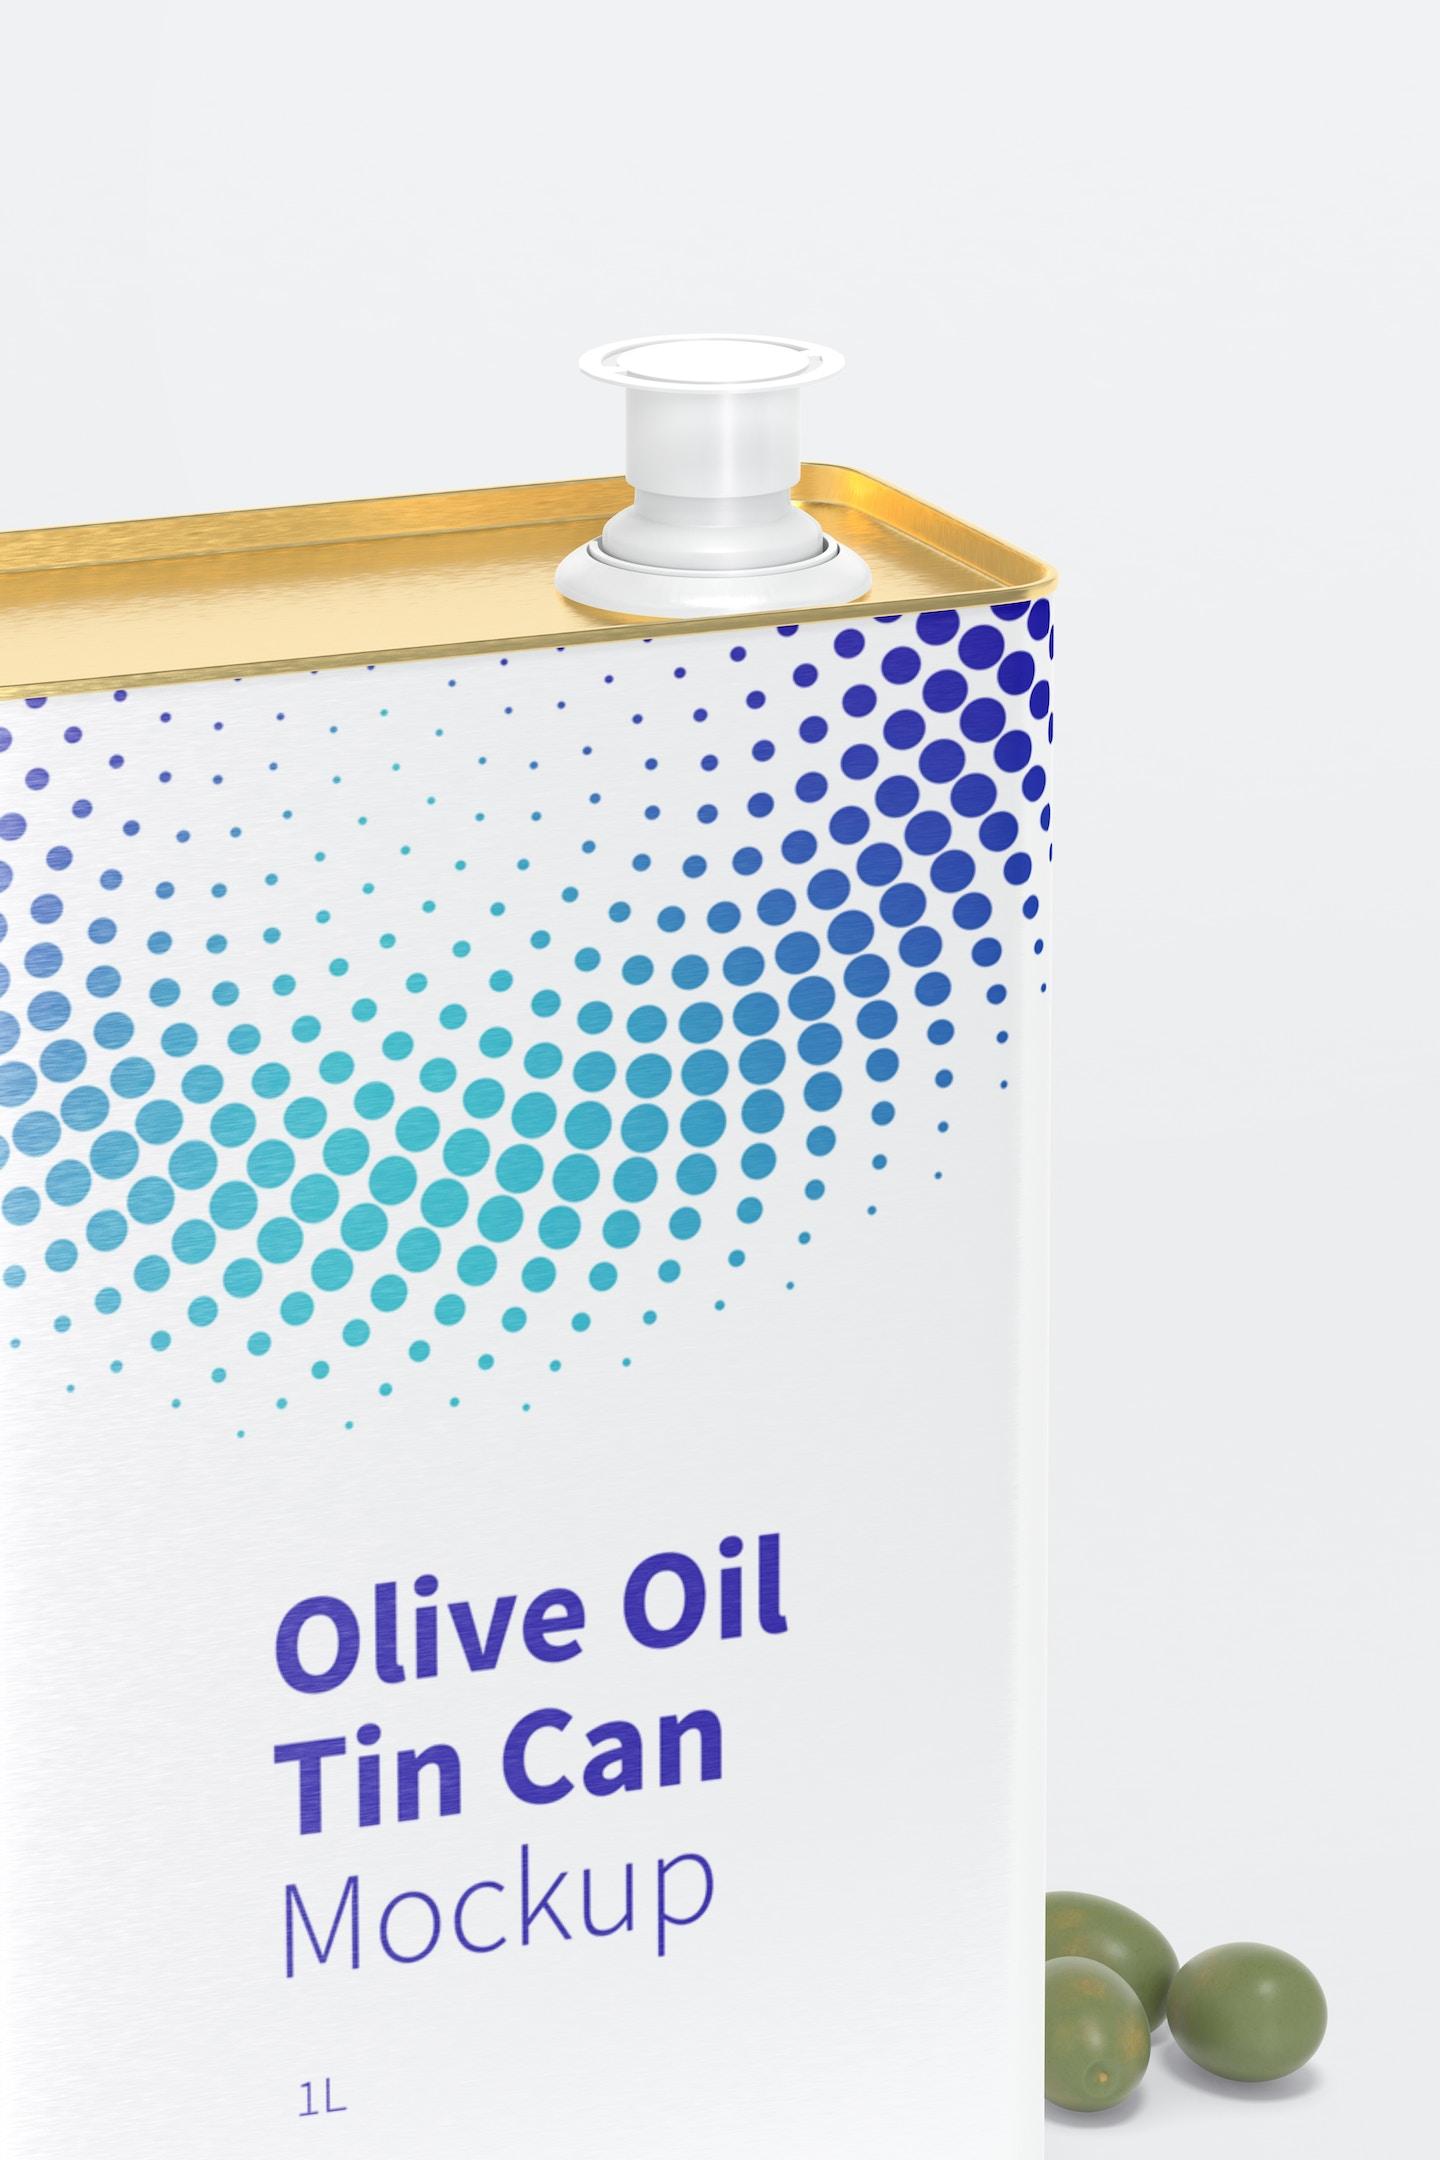 1 Liter Olive Oil Rectangular Tin Can Mockup, Close-Up